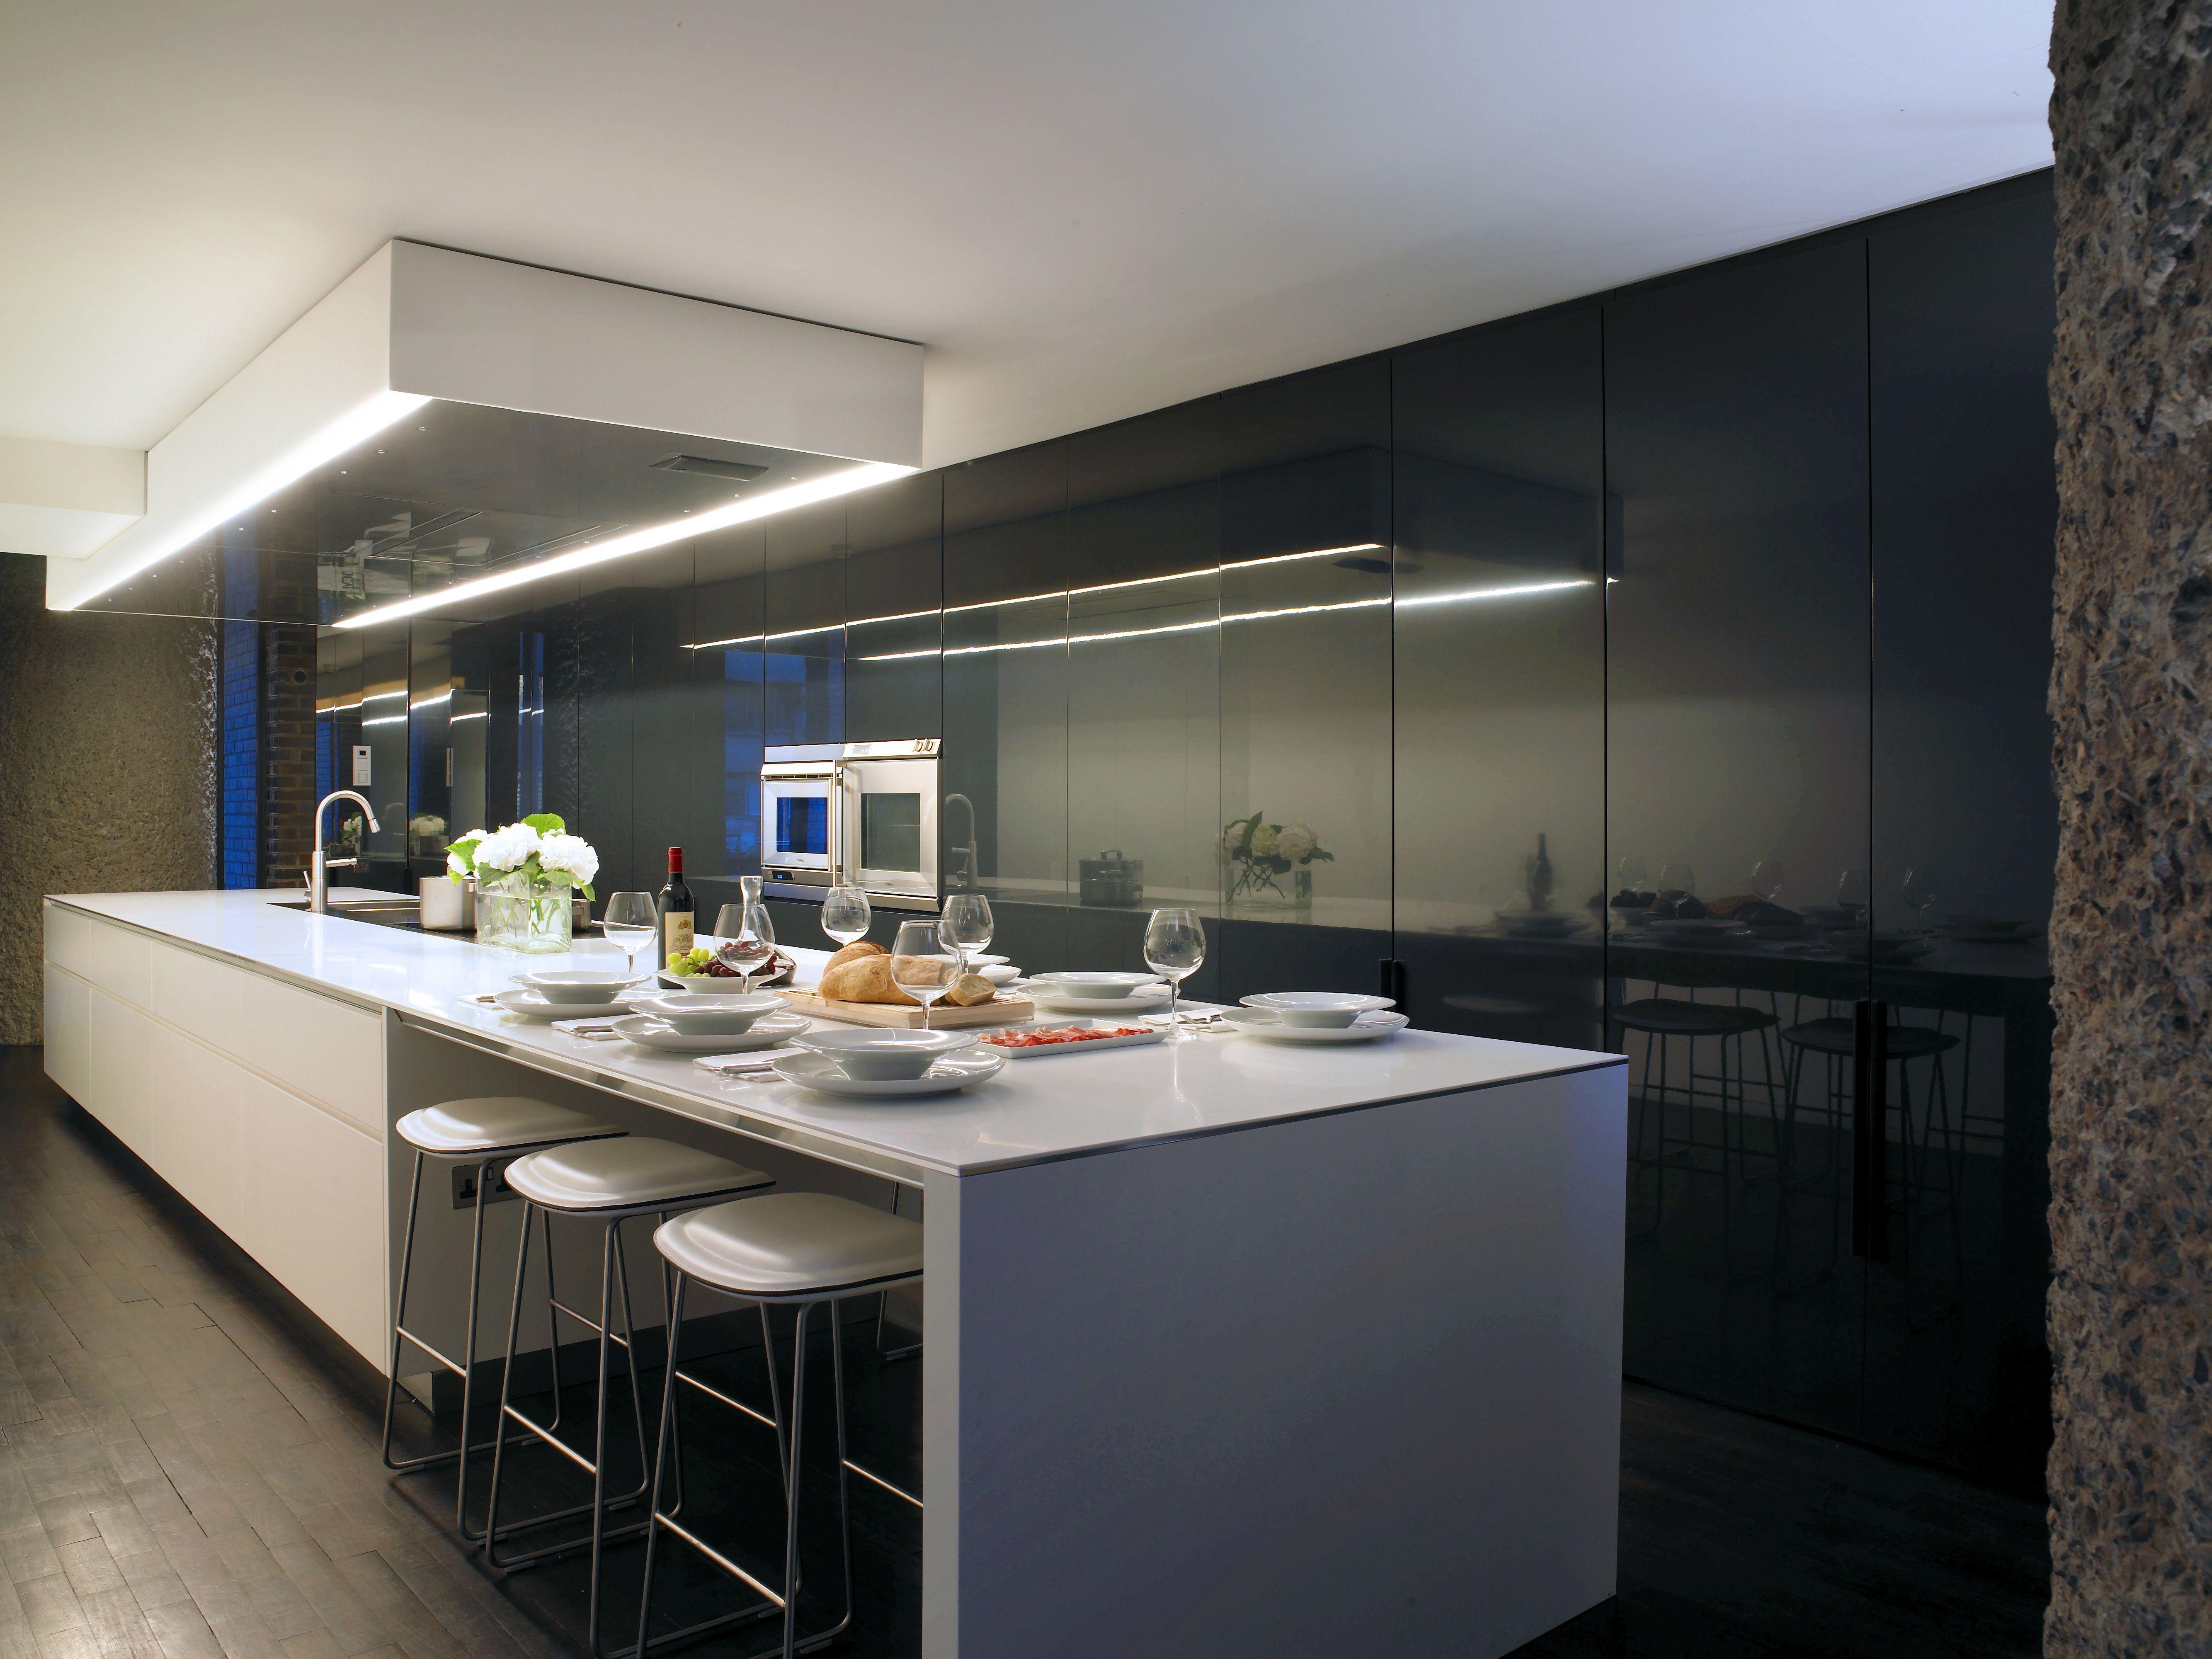 Comparing Snaidero To Ikea Euro Style Kitchen Cabinets